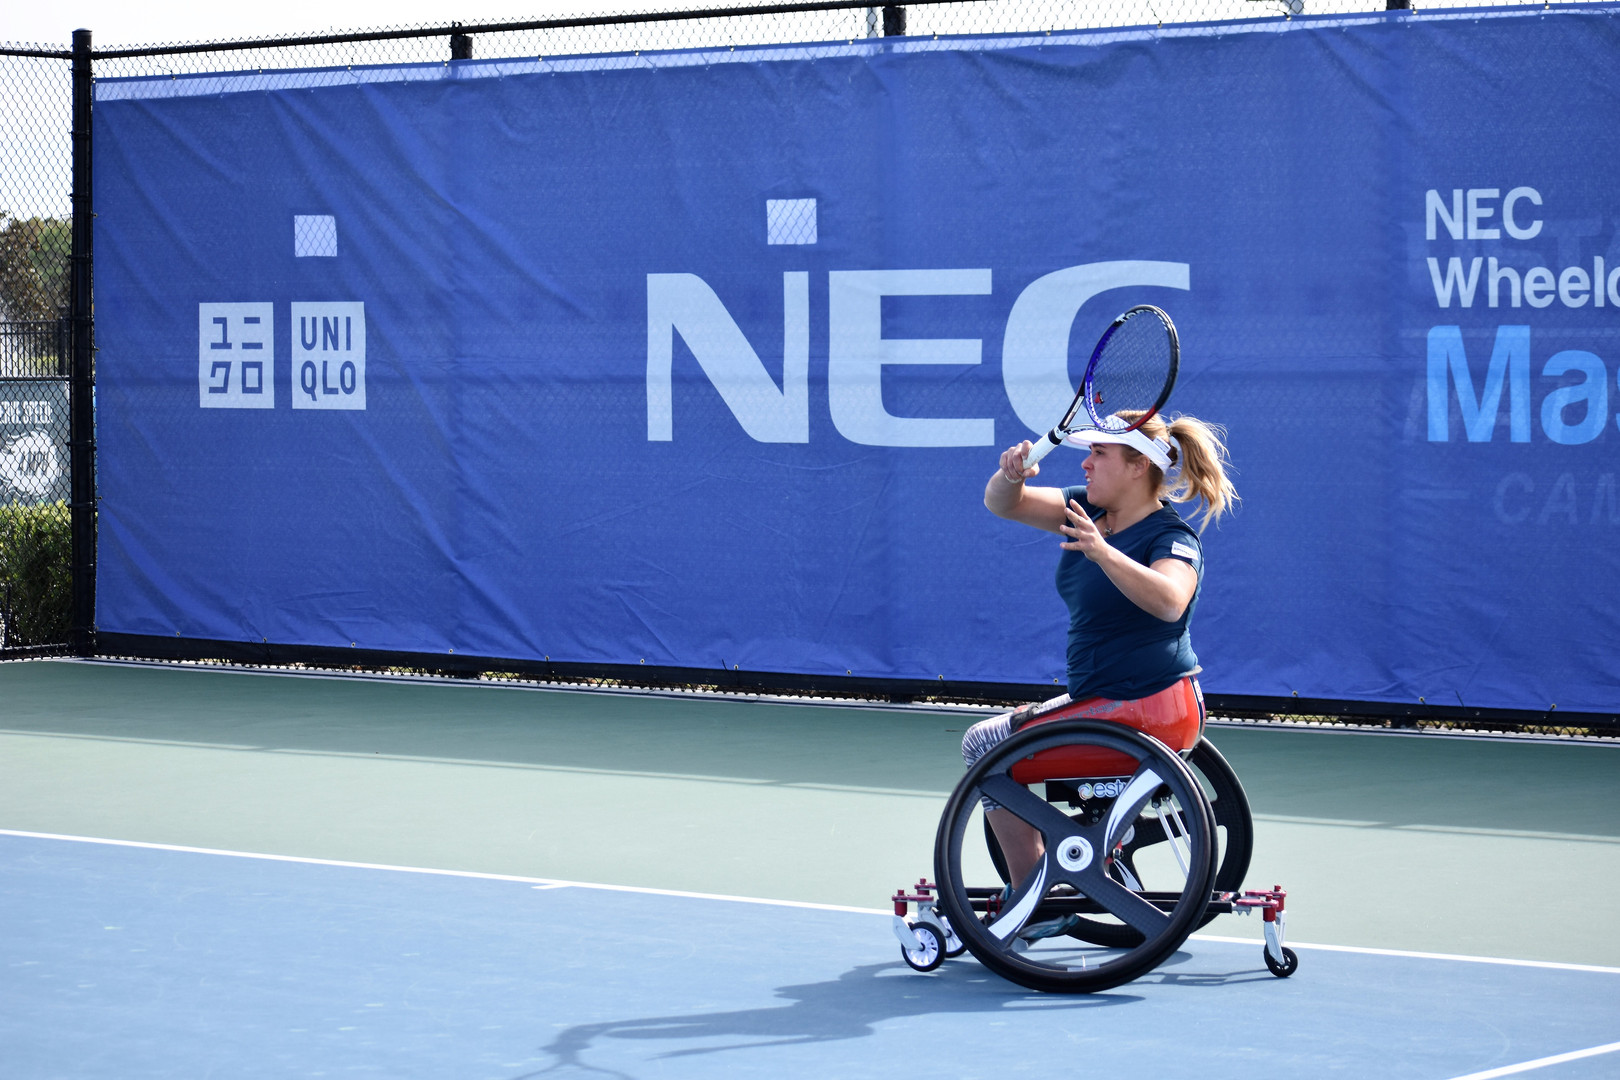 Giulia Capocci at the 2018 NEC Wheelchair Tennis Masters, Orlando, Fla. - Nov. 2018